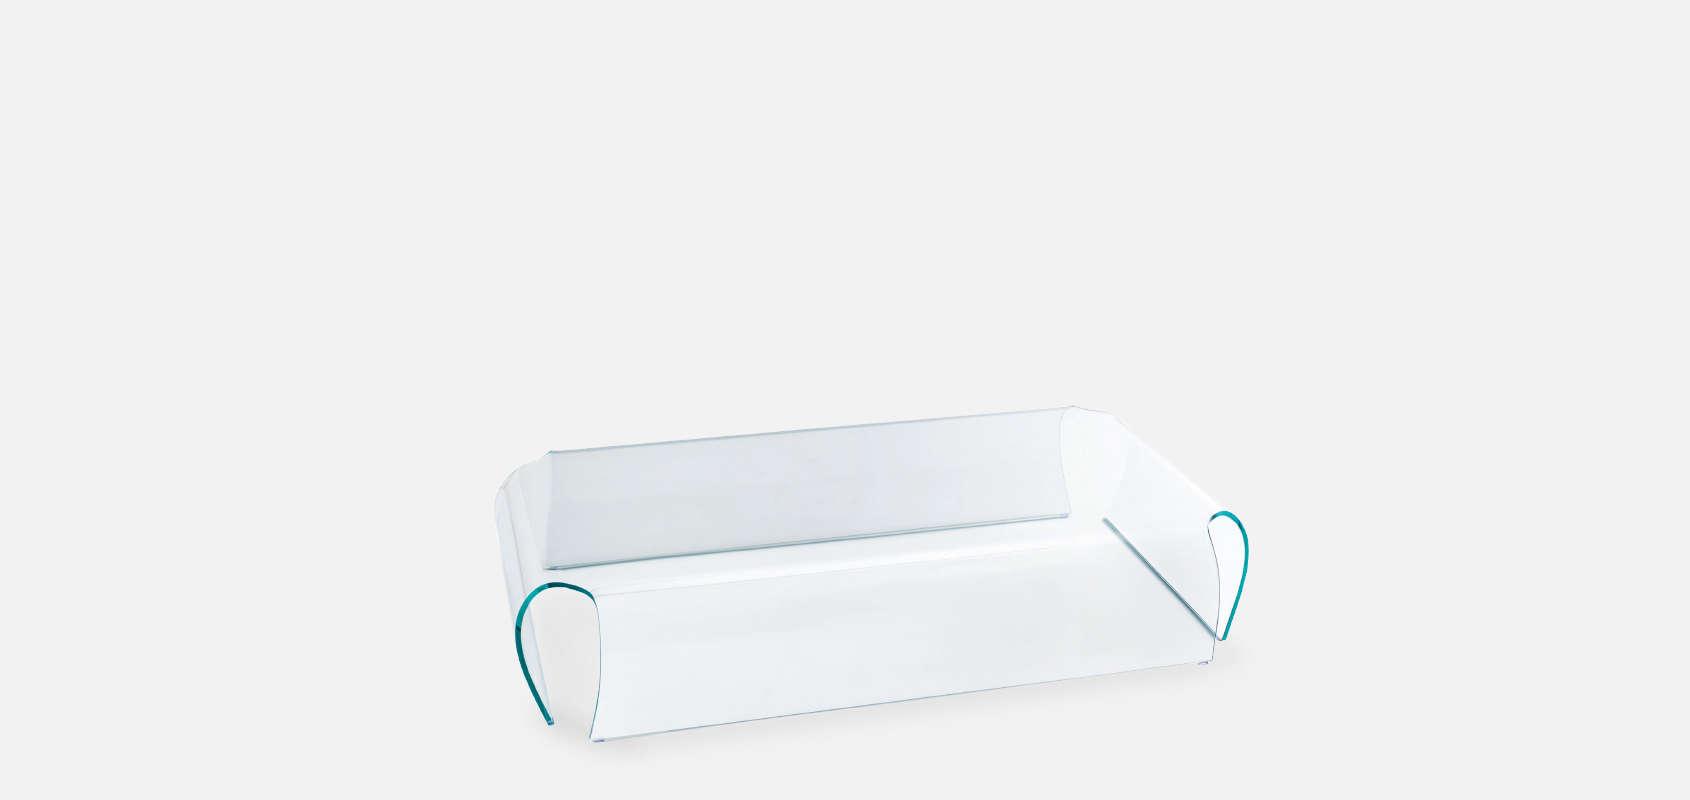 Bent Glass Coffee Table By Naoto Fukasawa For Glas Italia ...